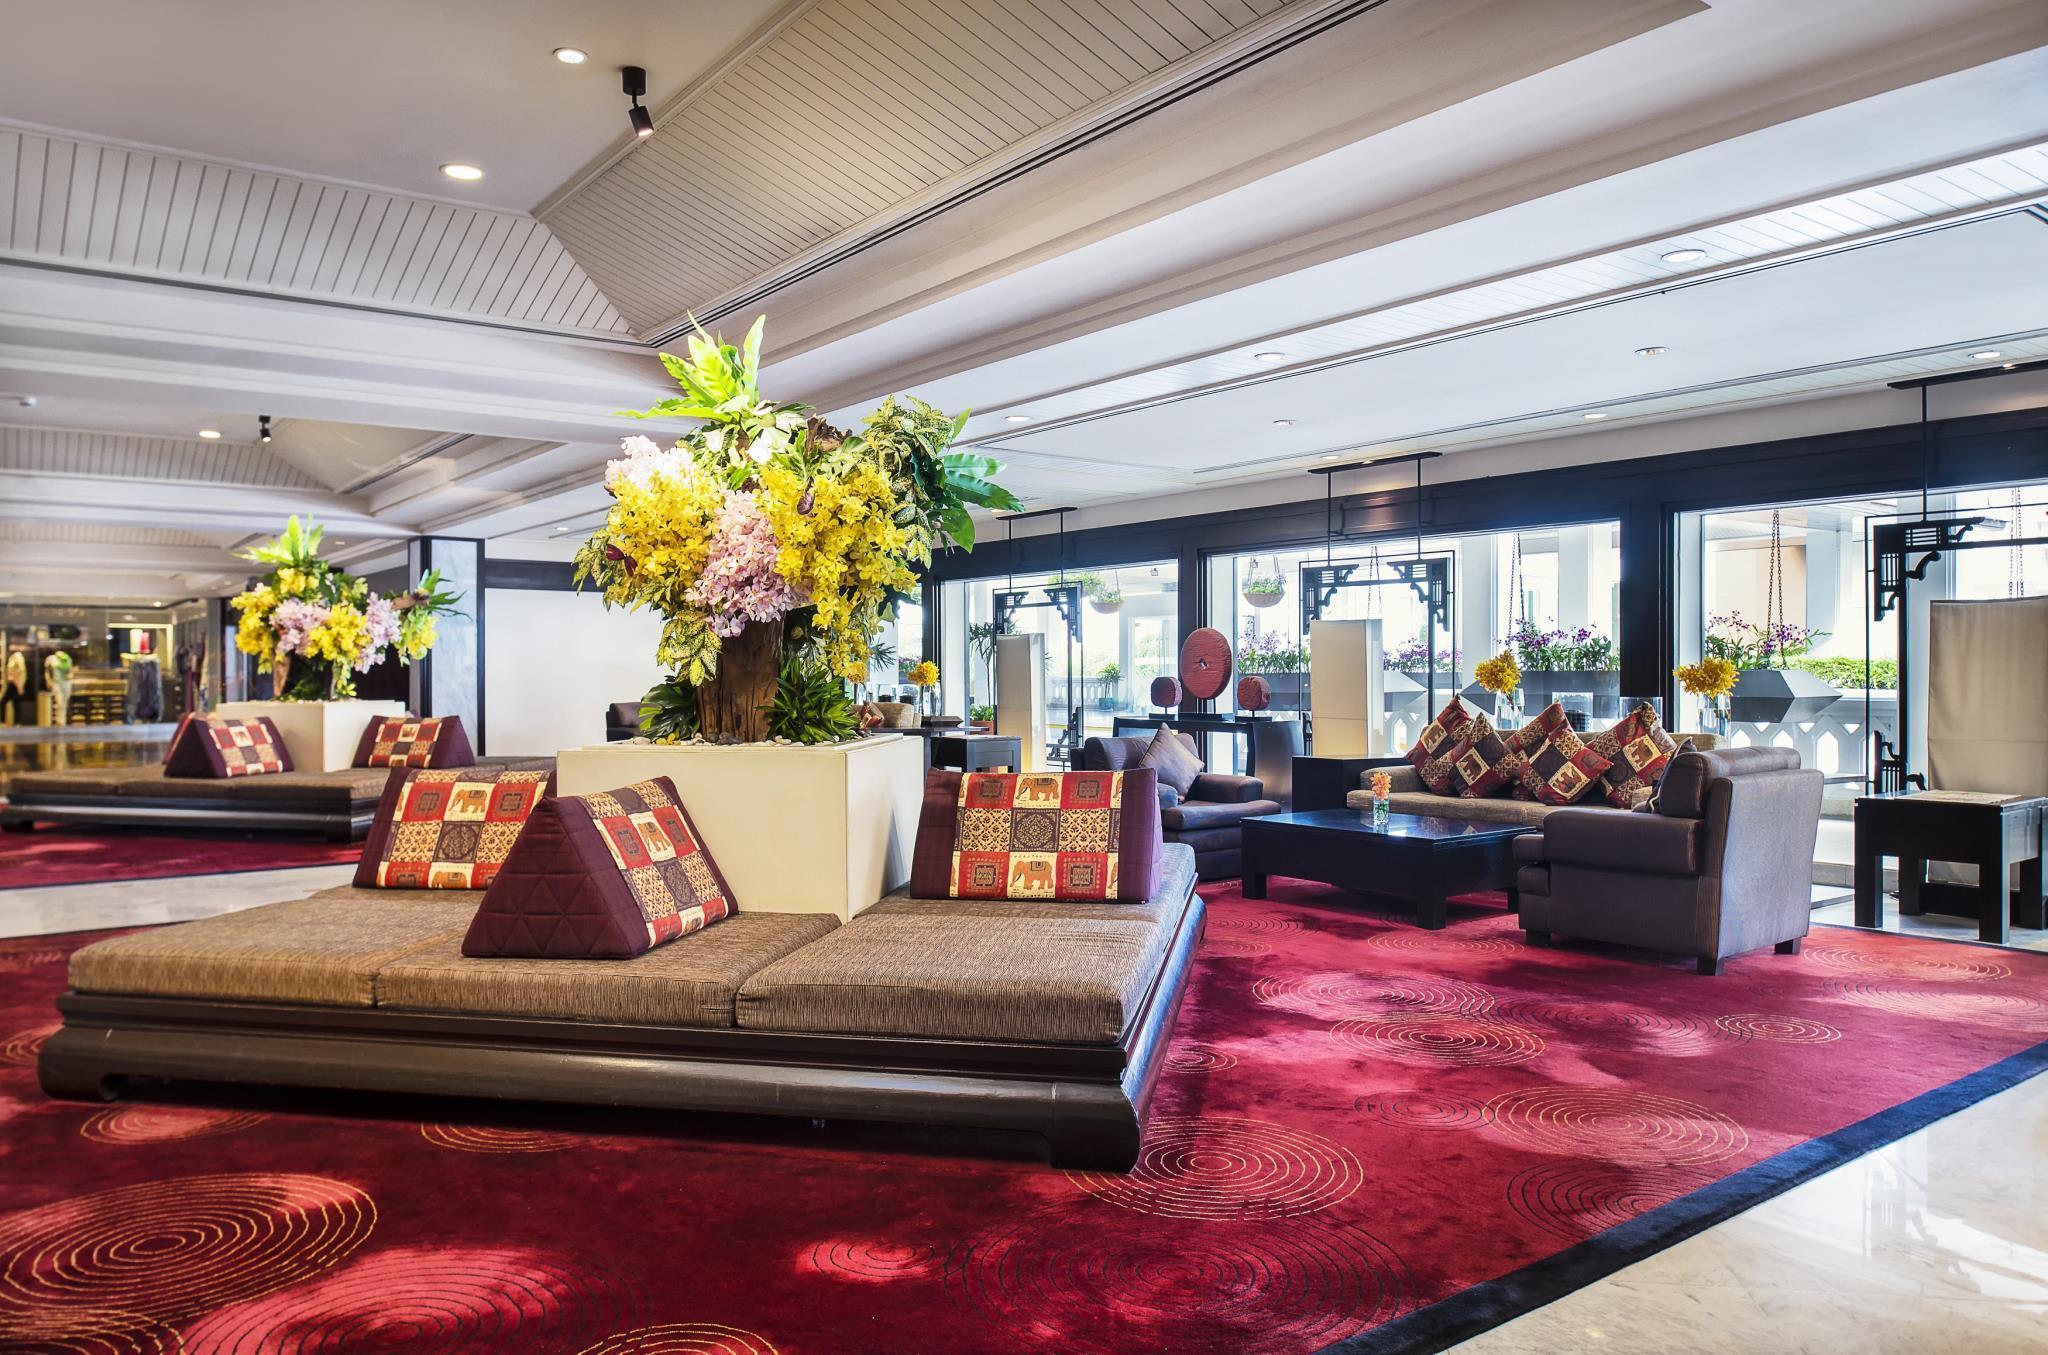 Anantara Riverside Bangkok Resort อนันตรา ริเวอร์ไซด์ กรุงเทพฯ รีสอร์ต